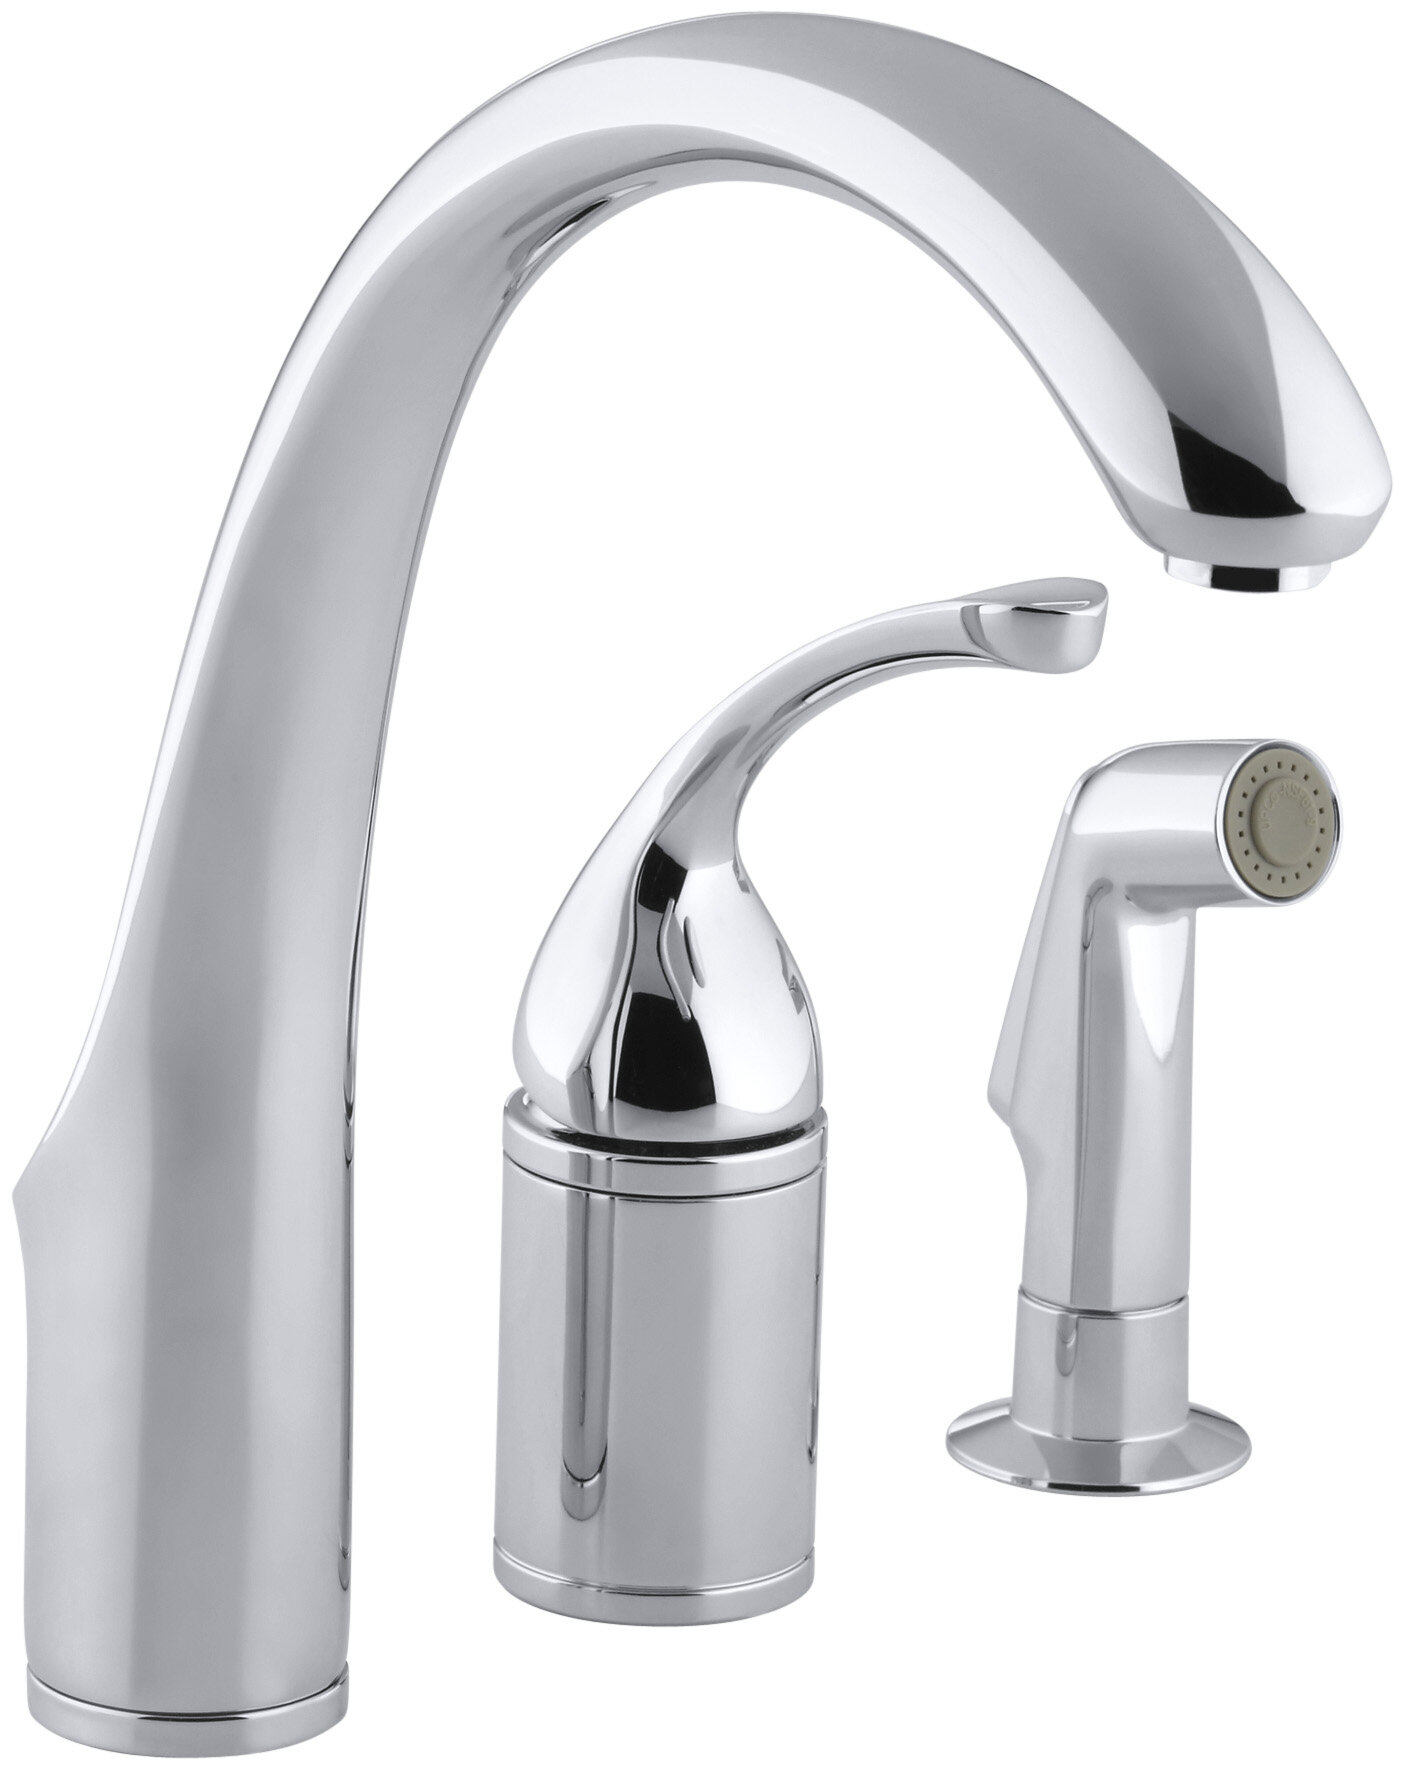 product modulus faucet widespread faucets dxv fluid